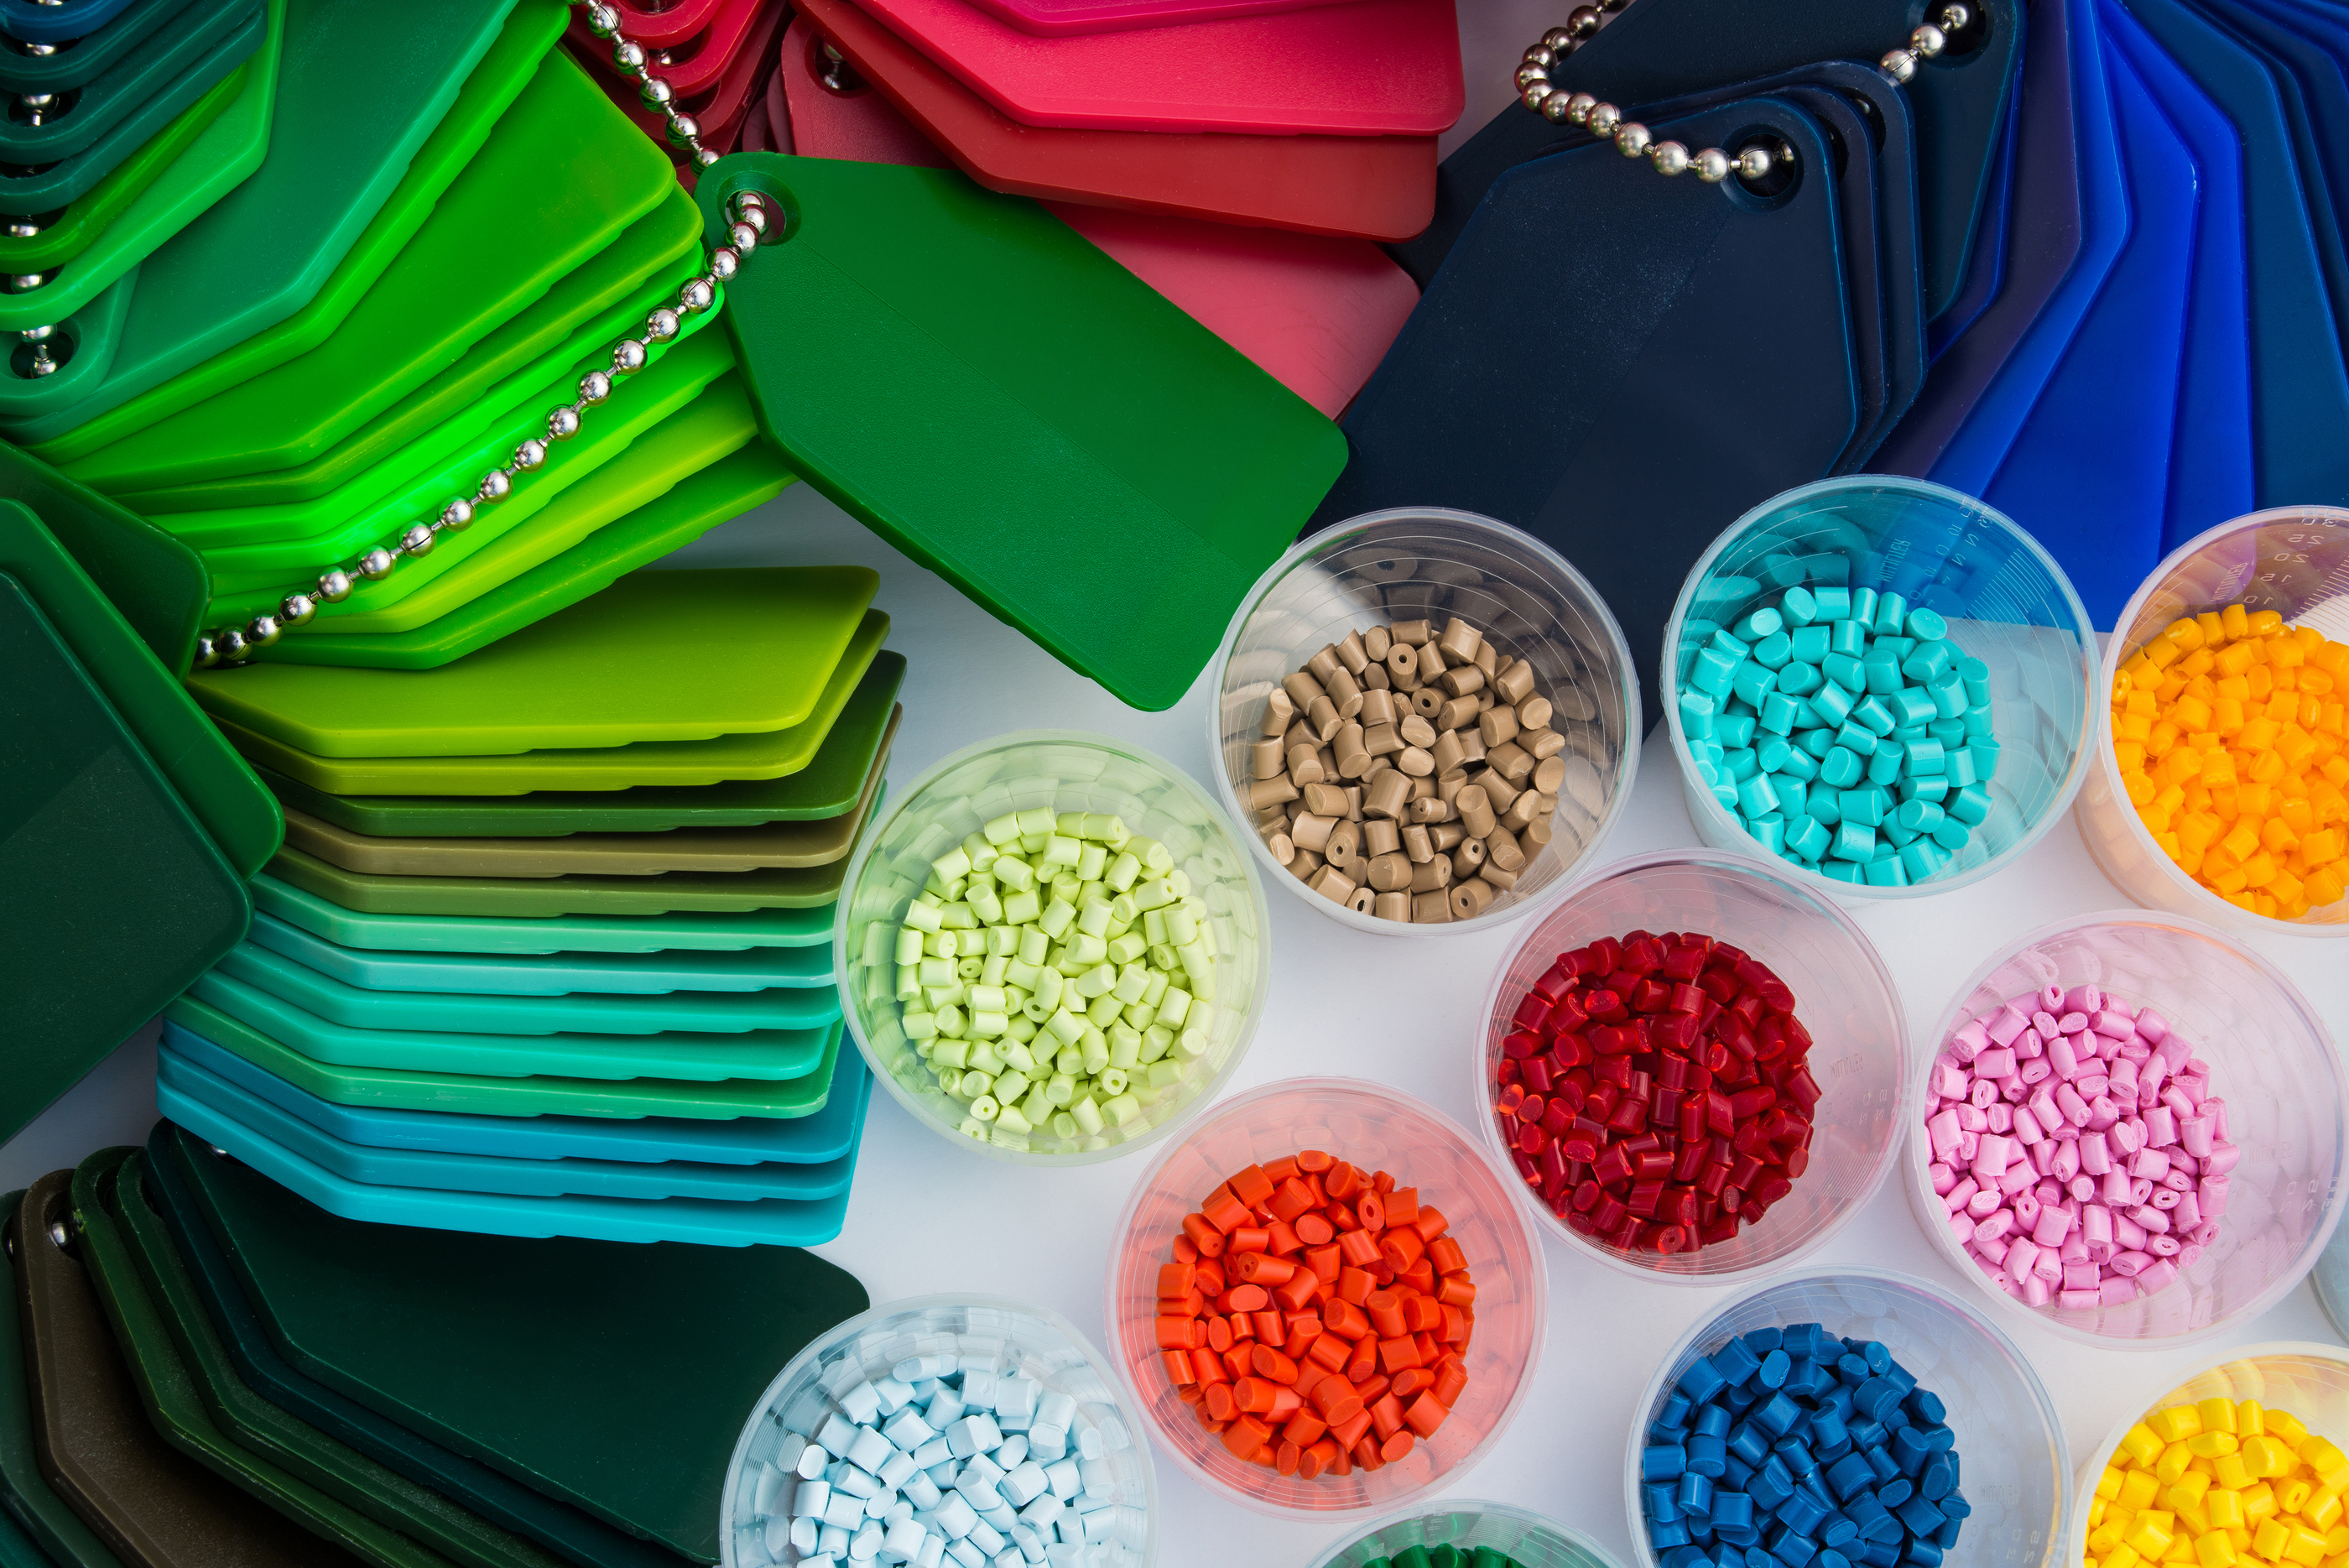 Kunststoff- und Gummiindustrie